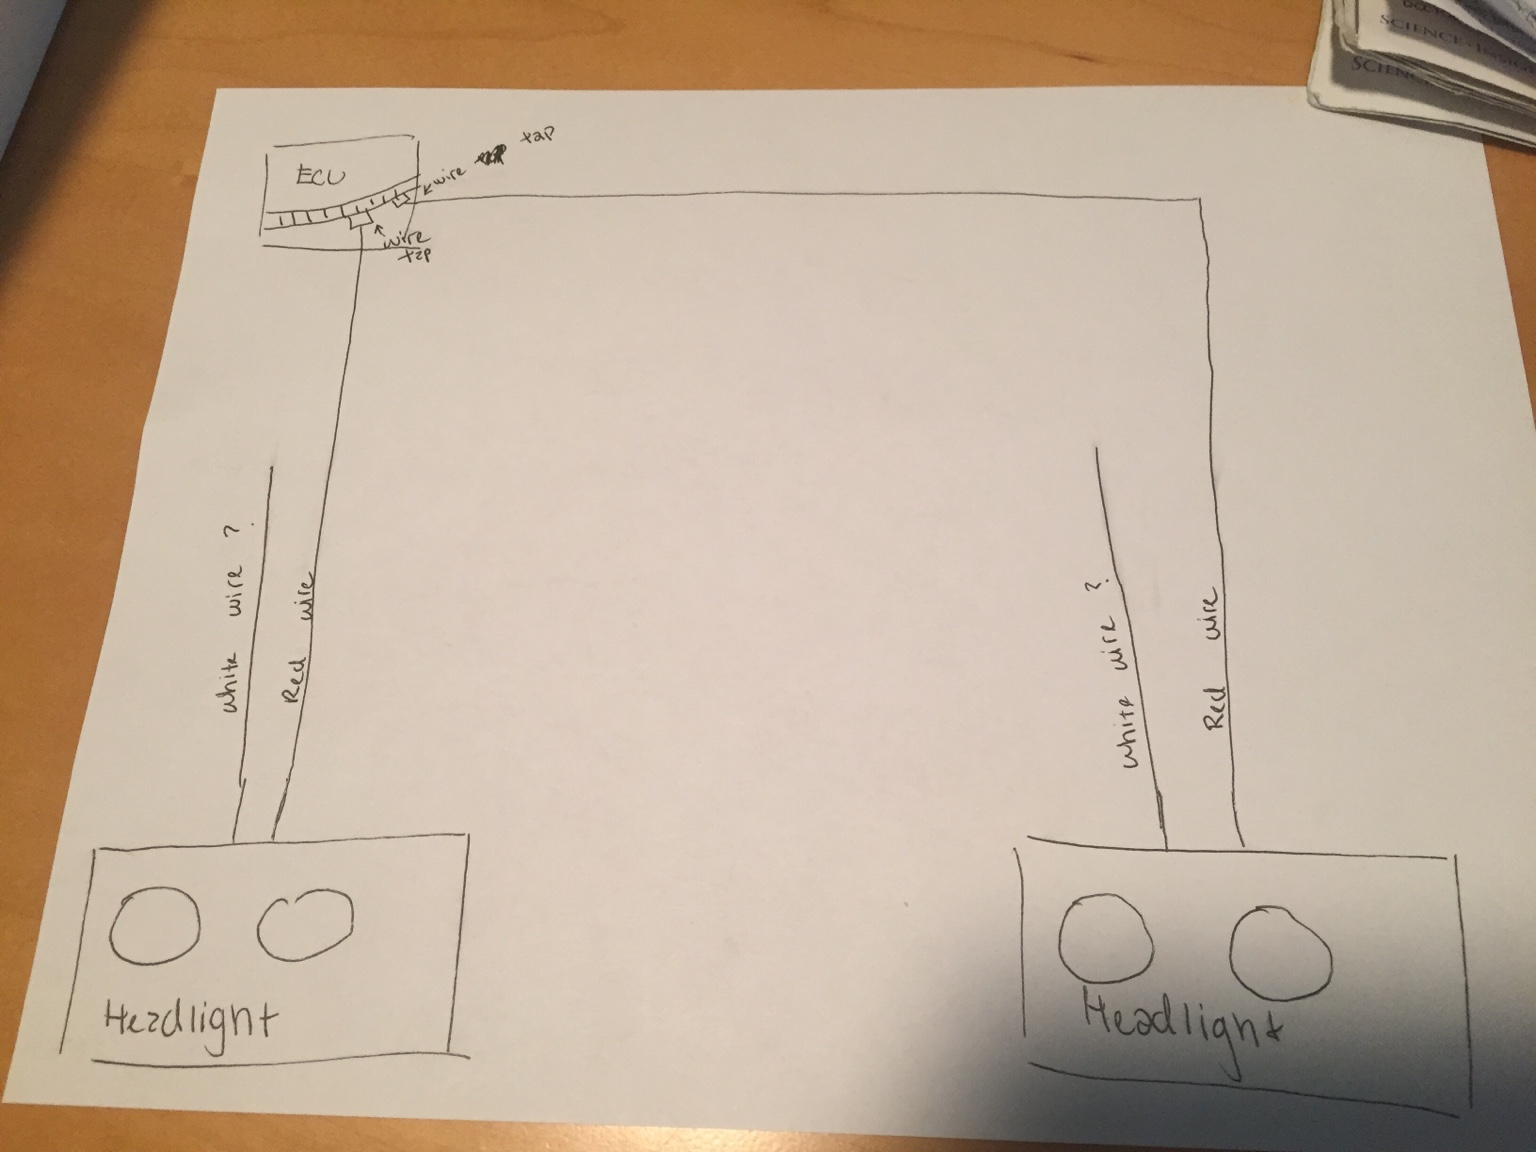 hight resolution of headlight wiring diagram 2013 bmw m5